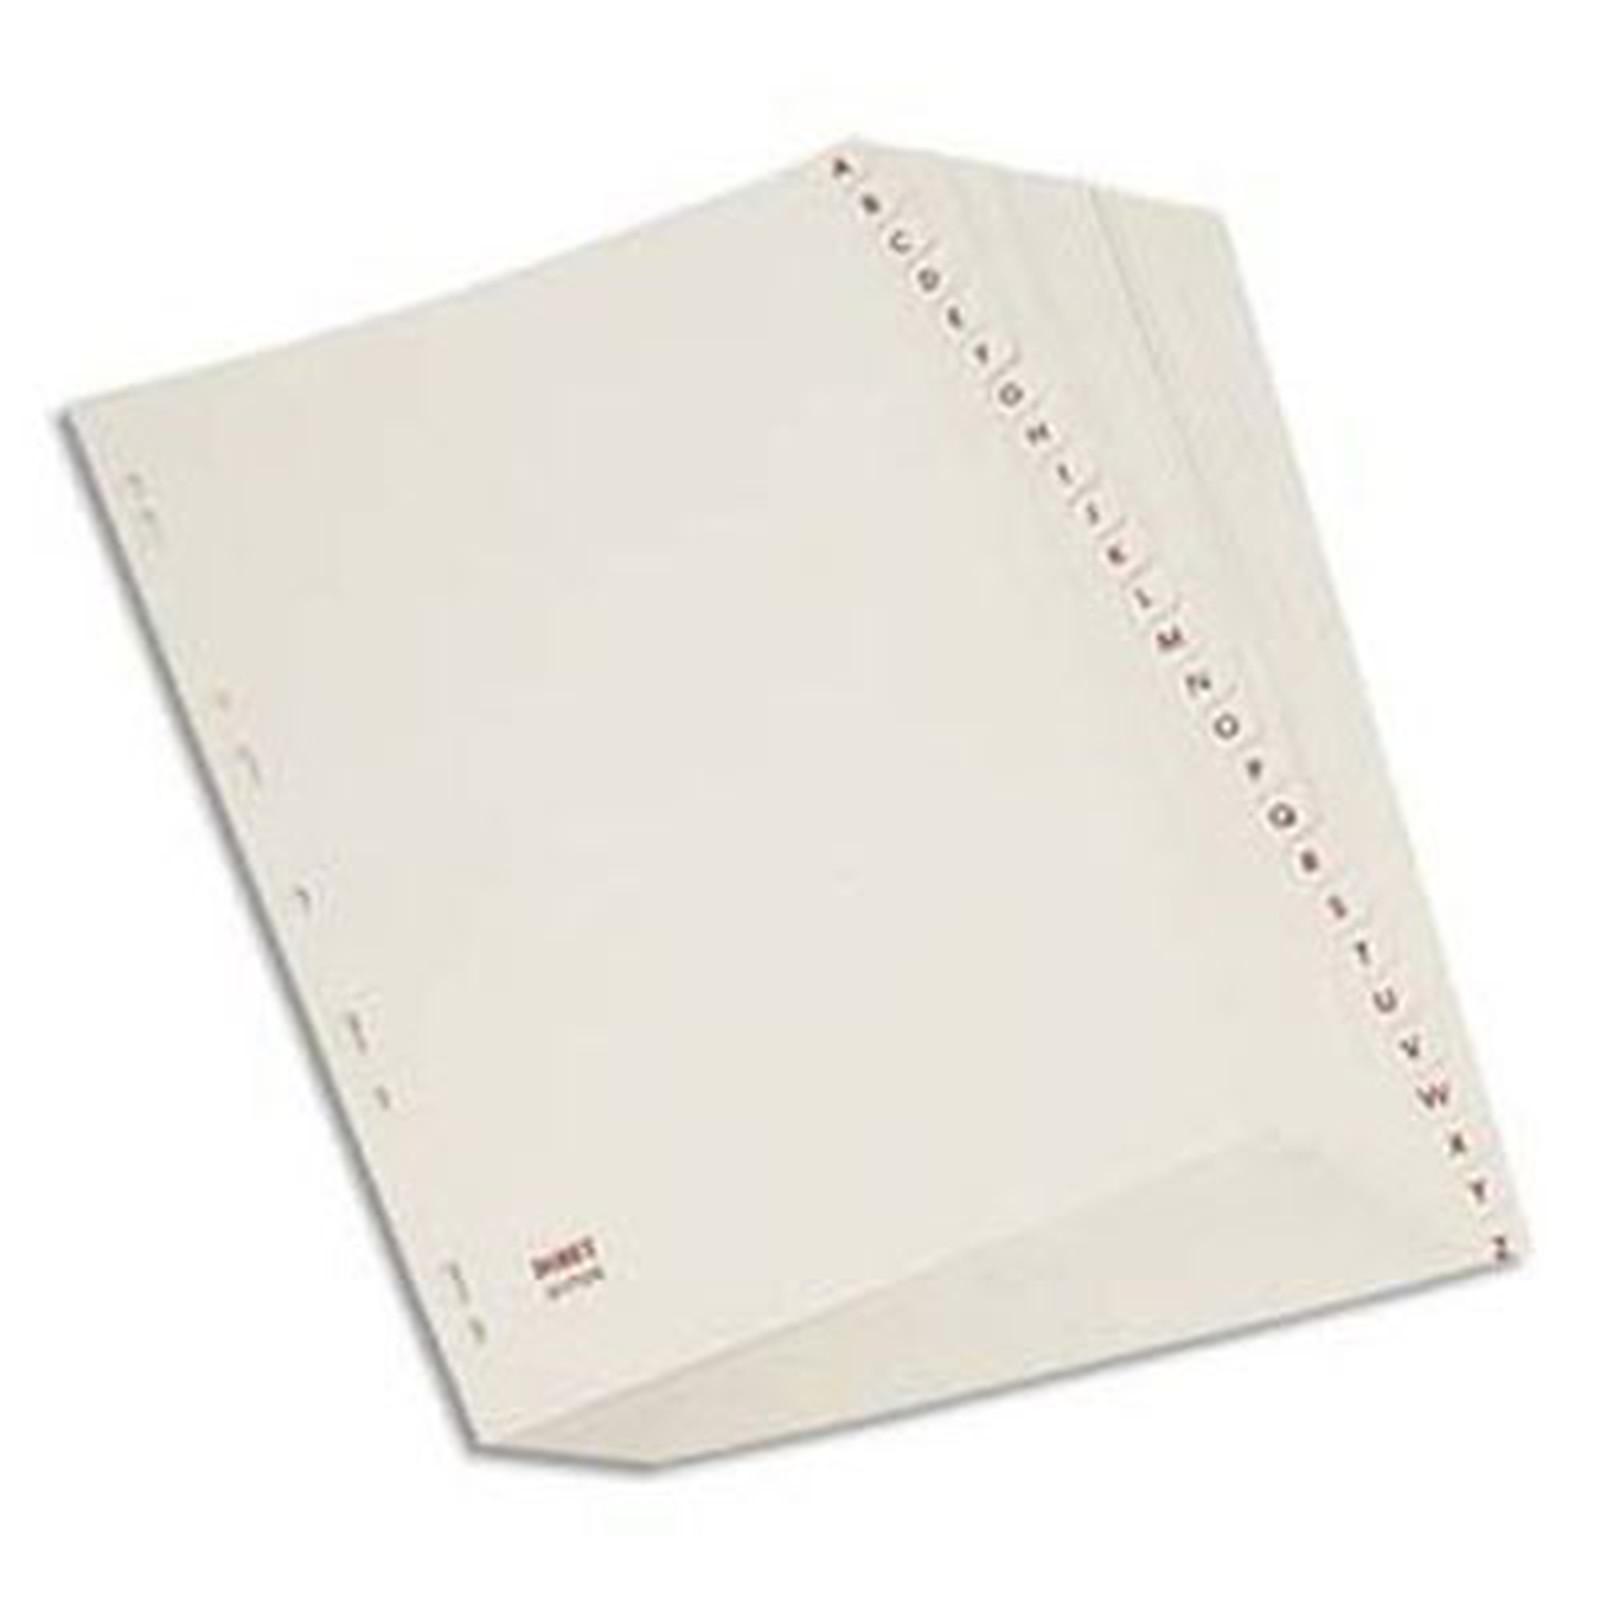 Elba Intercalaires Format A4 26 touches alphabétiques